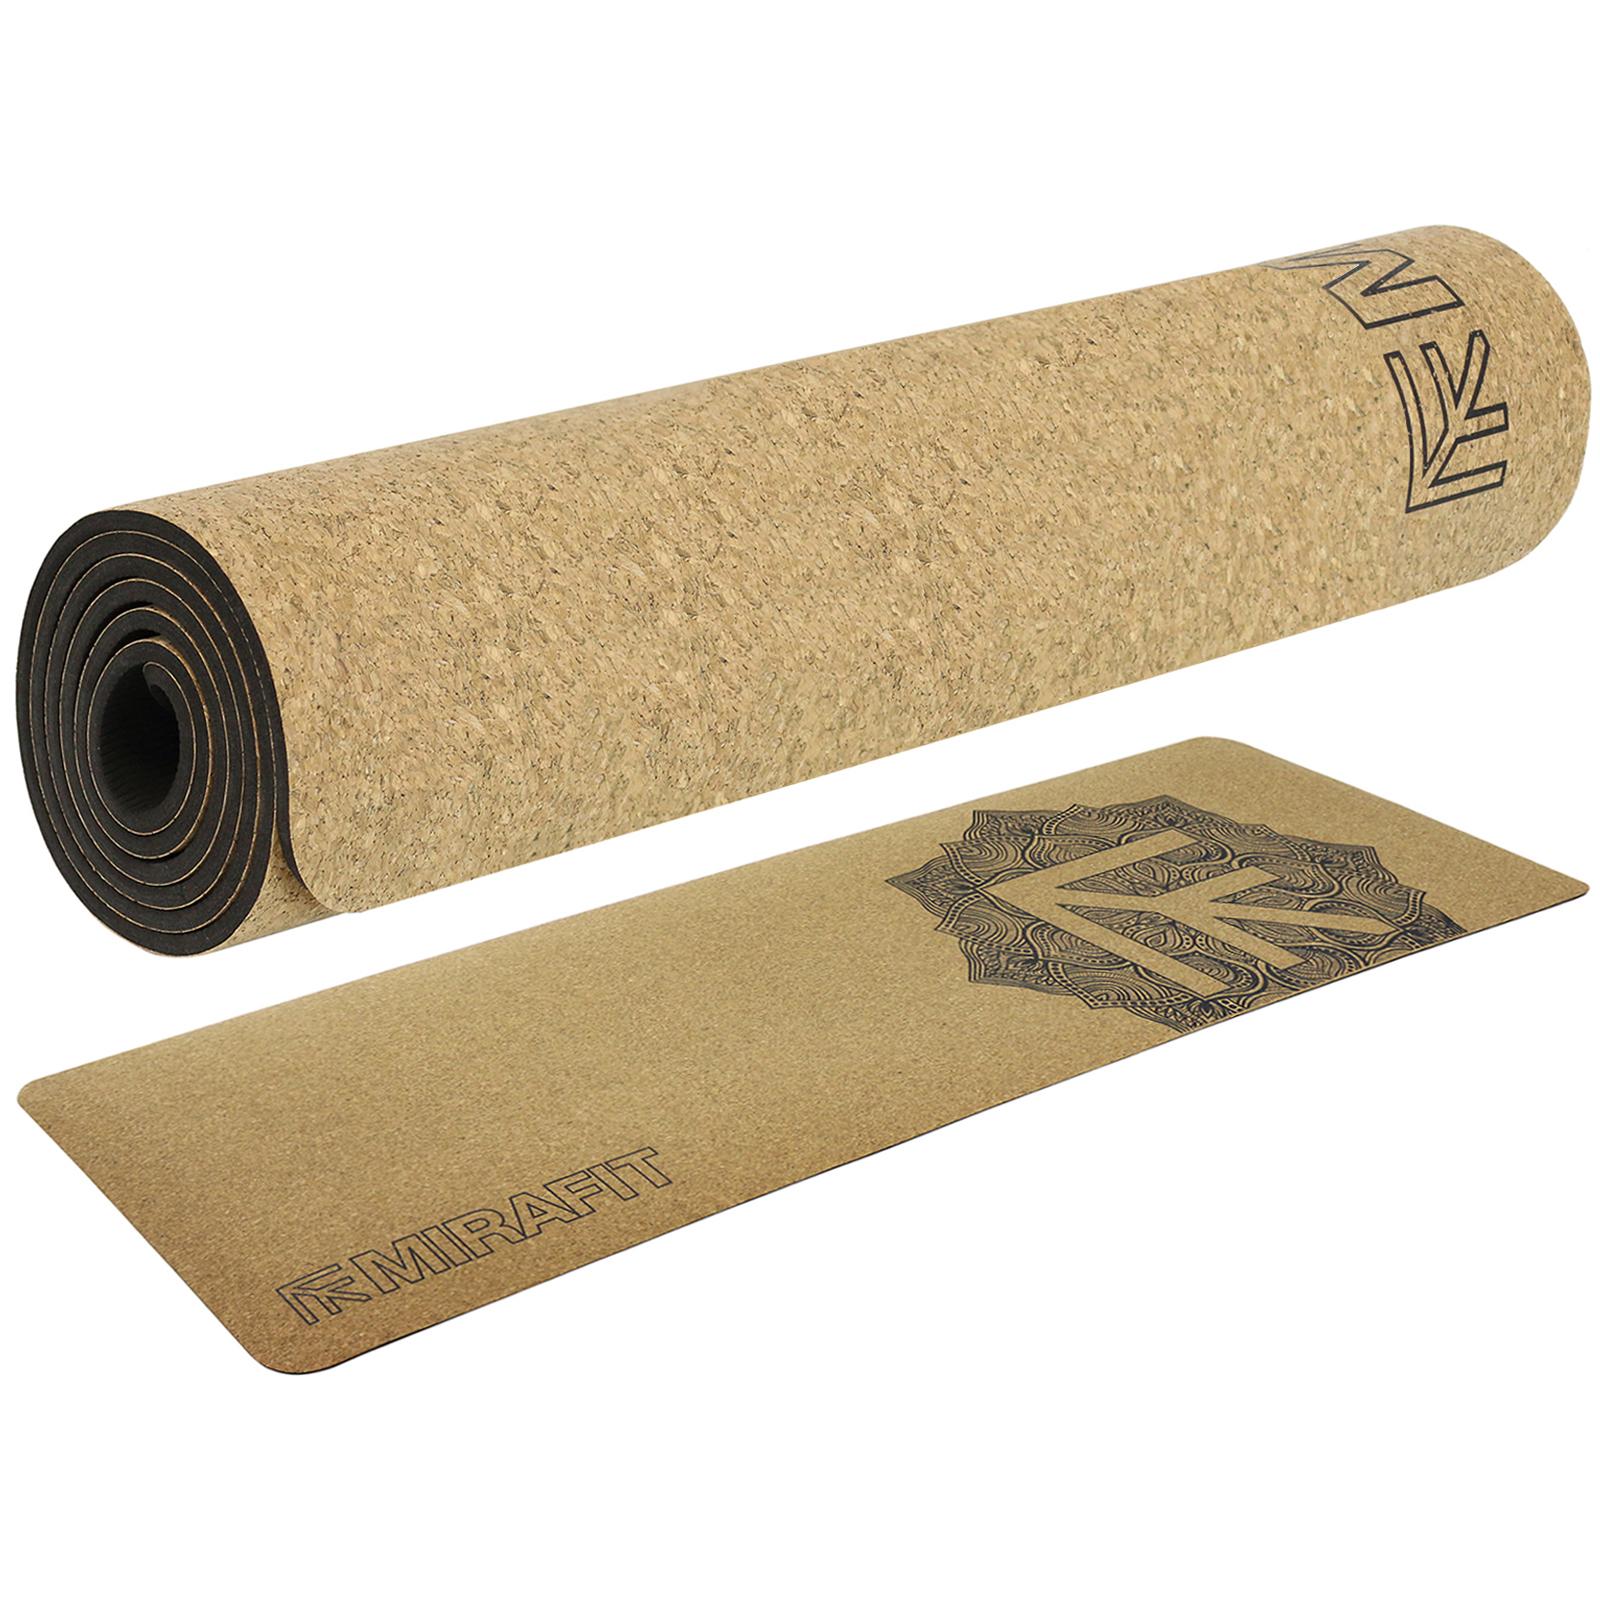 cork en yoga mats canada ip walmart mat jelinek